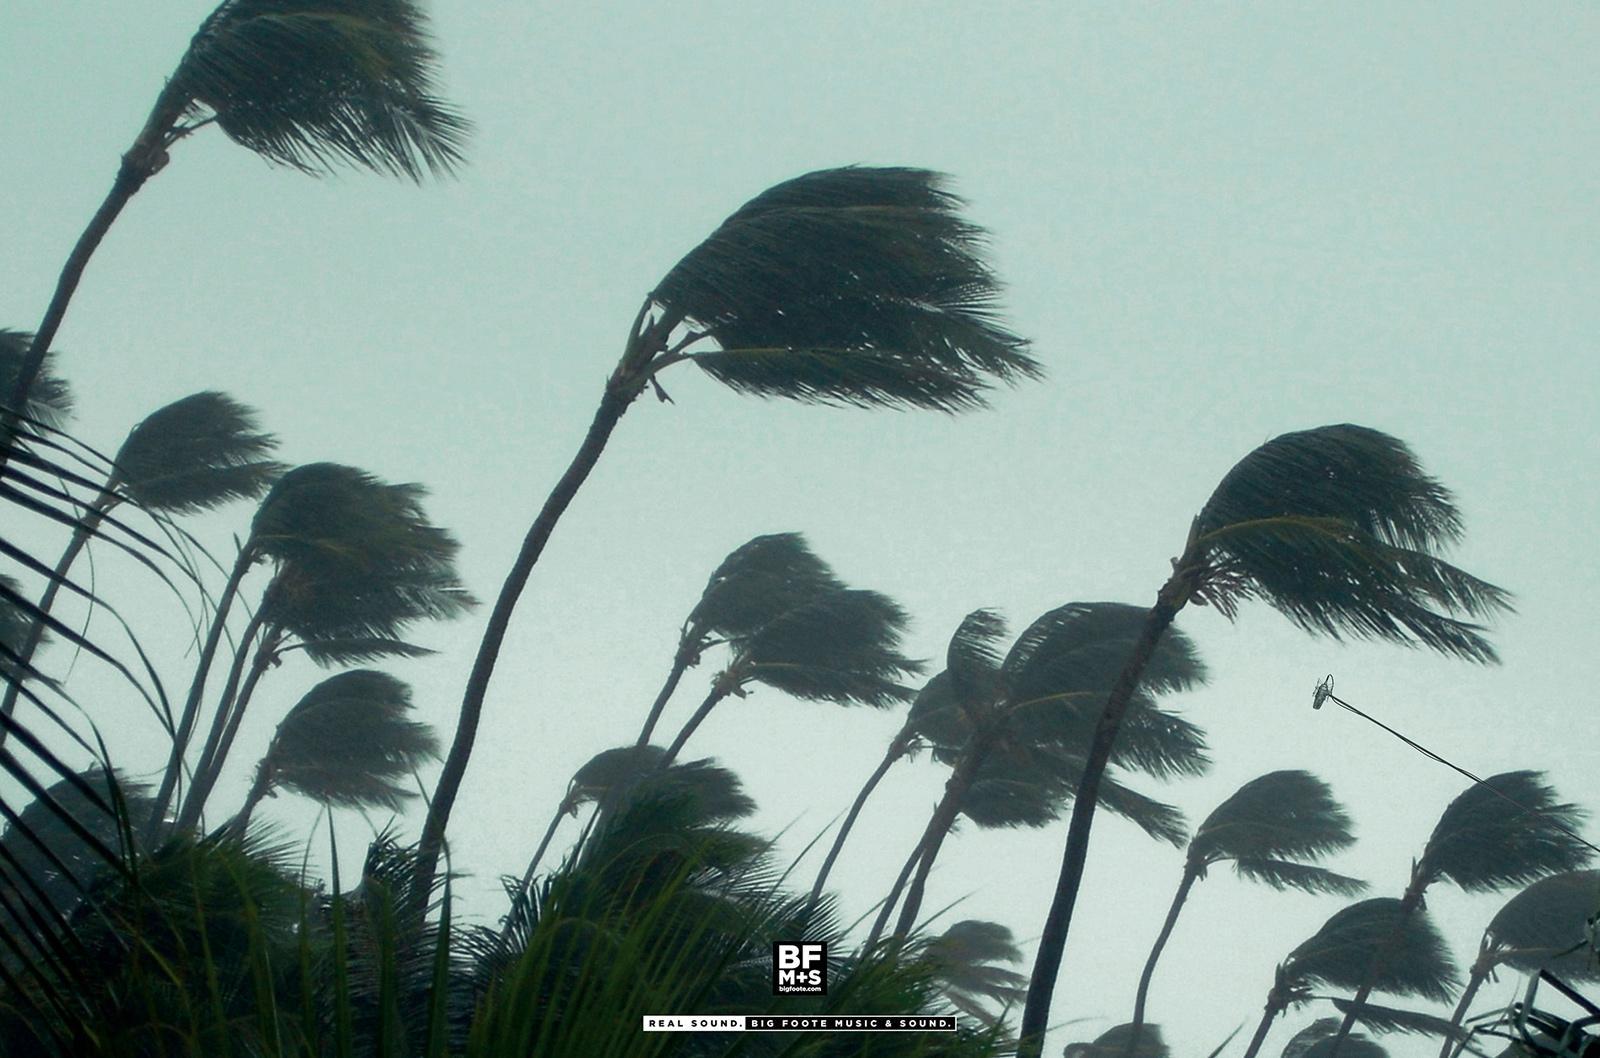 Big Foote Music & Sound Print Ad -  Hurricane